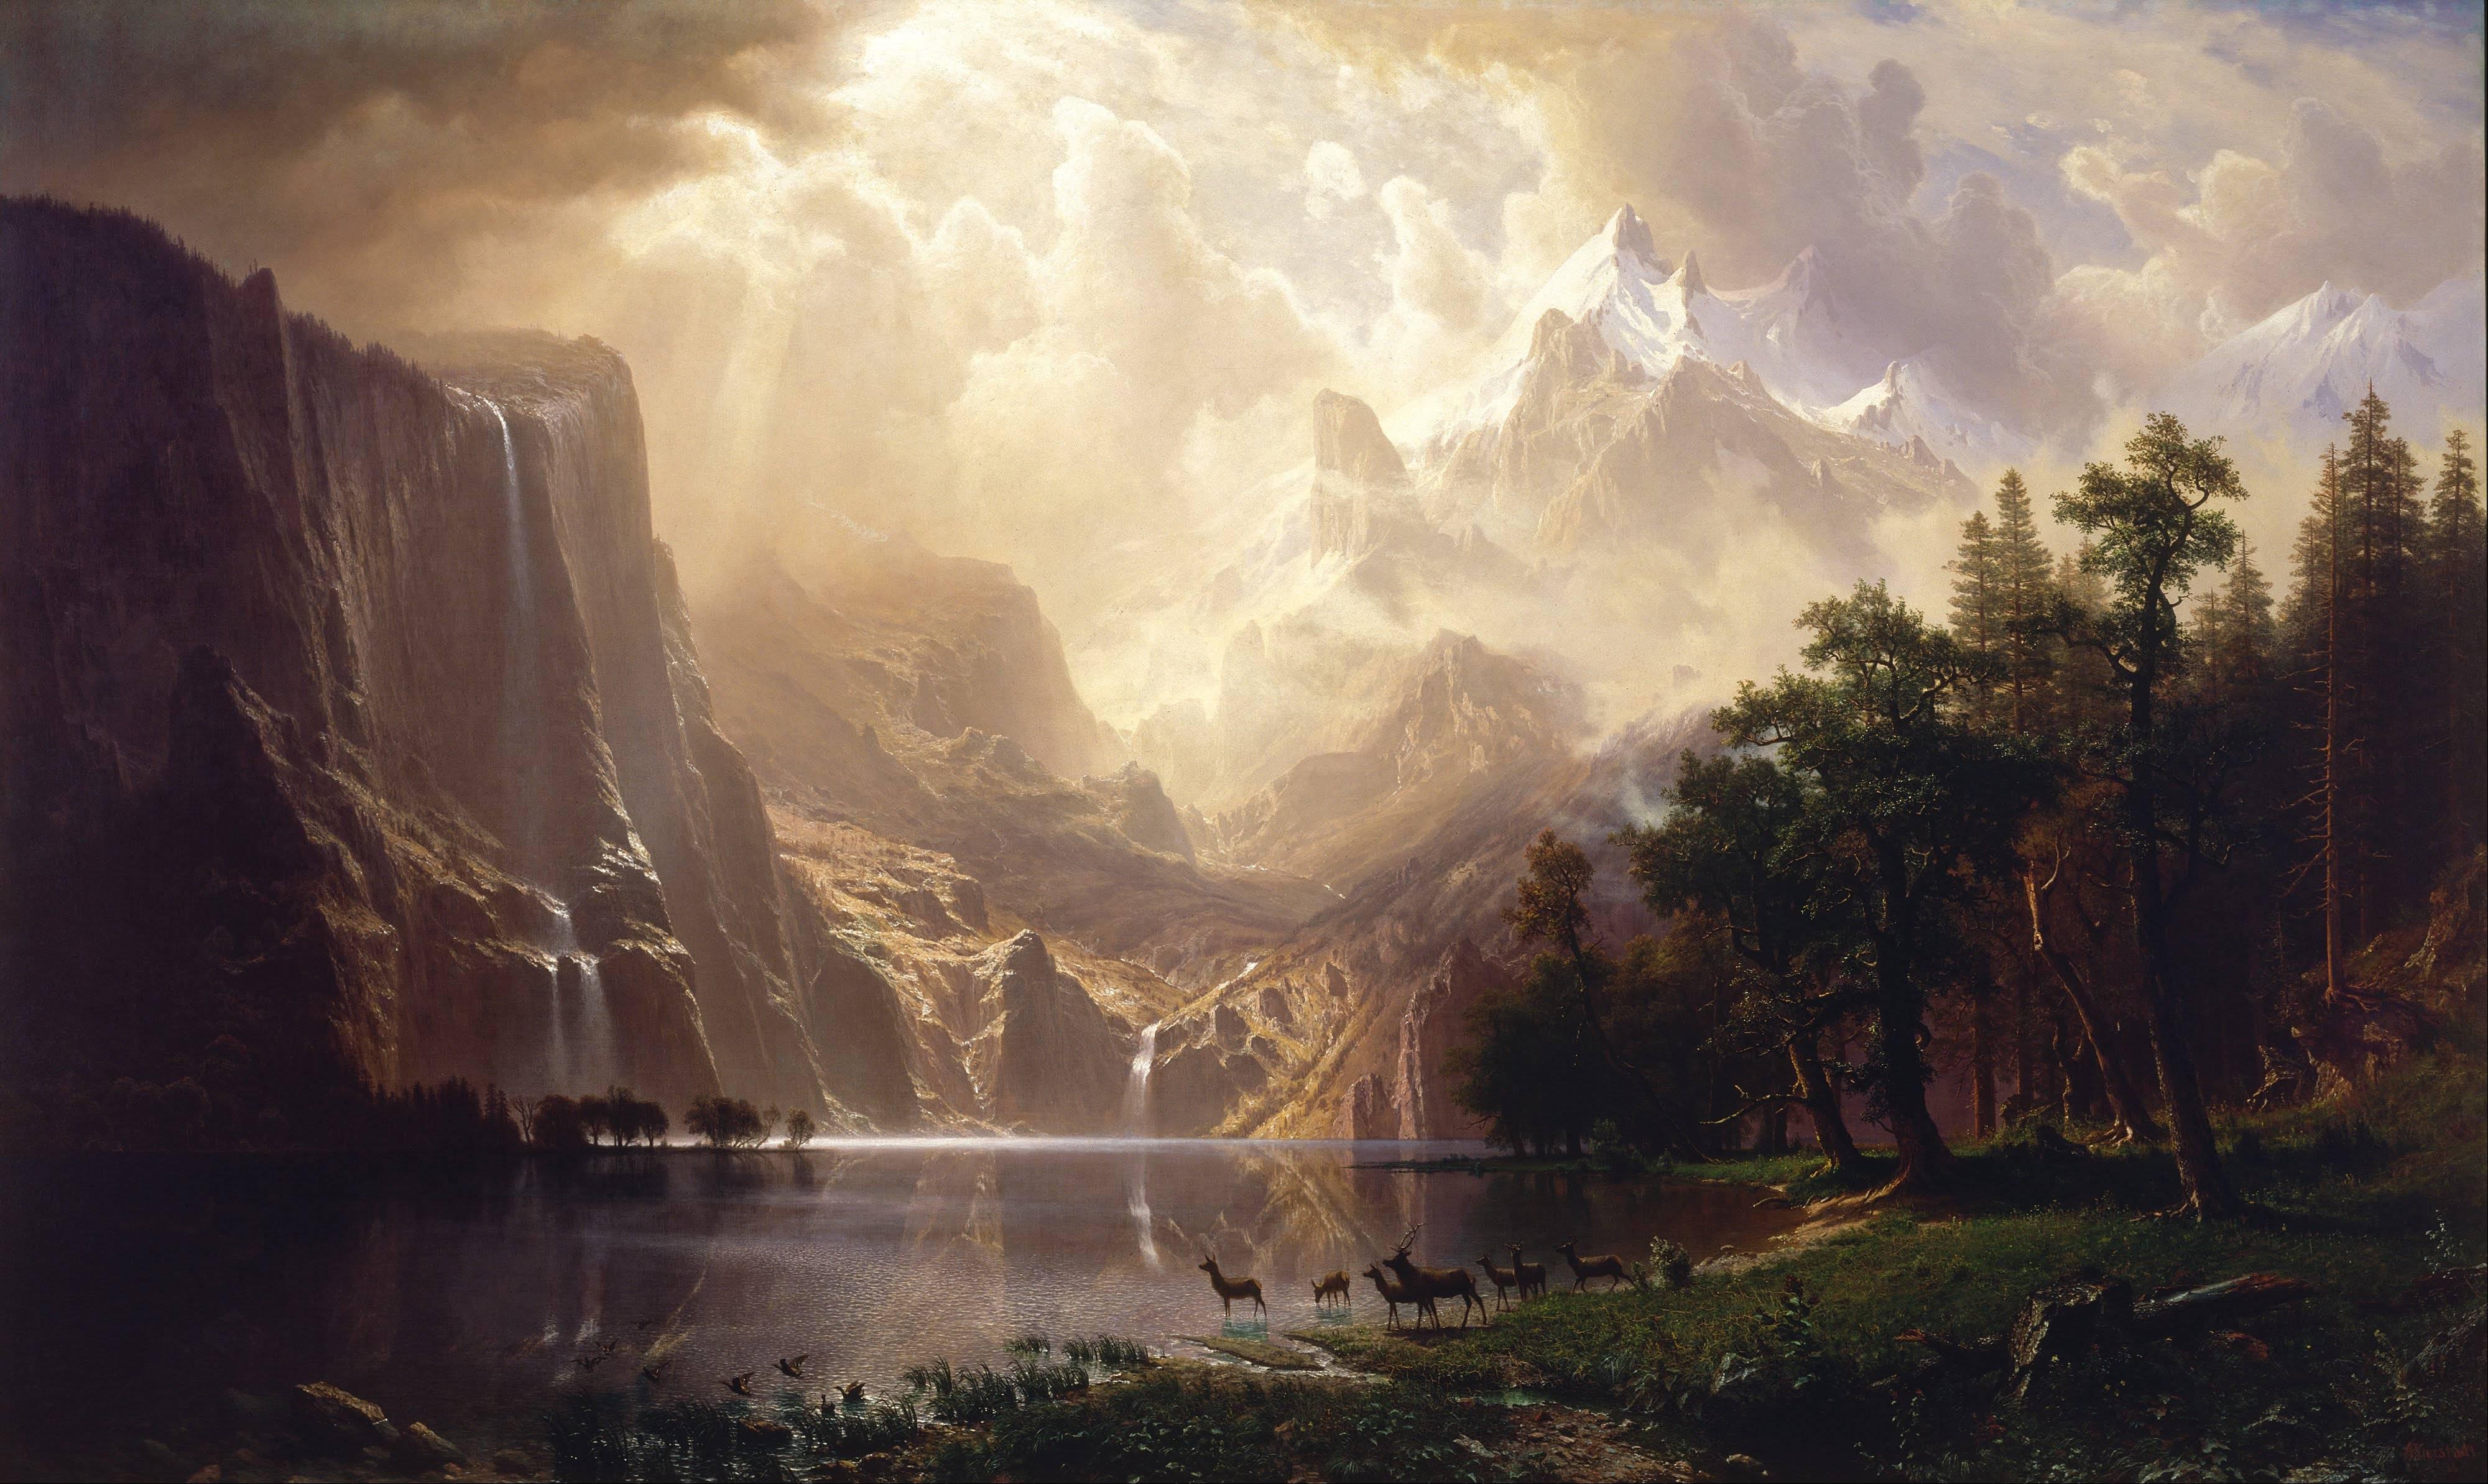 Albert Bierstadt, Sierra Nevada, California, 1868. Smithsonian American Art Museum, Washington, DC